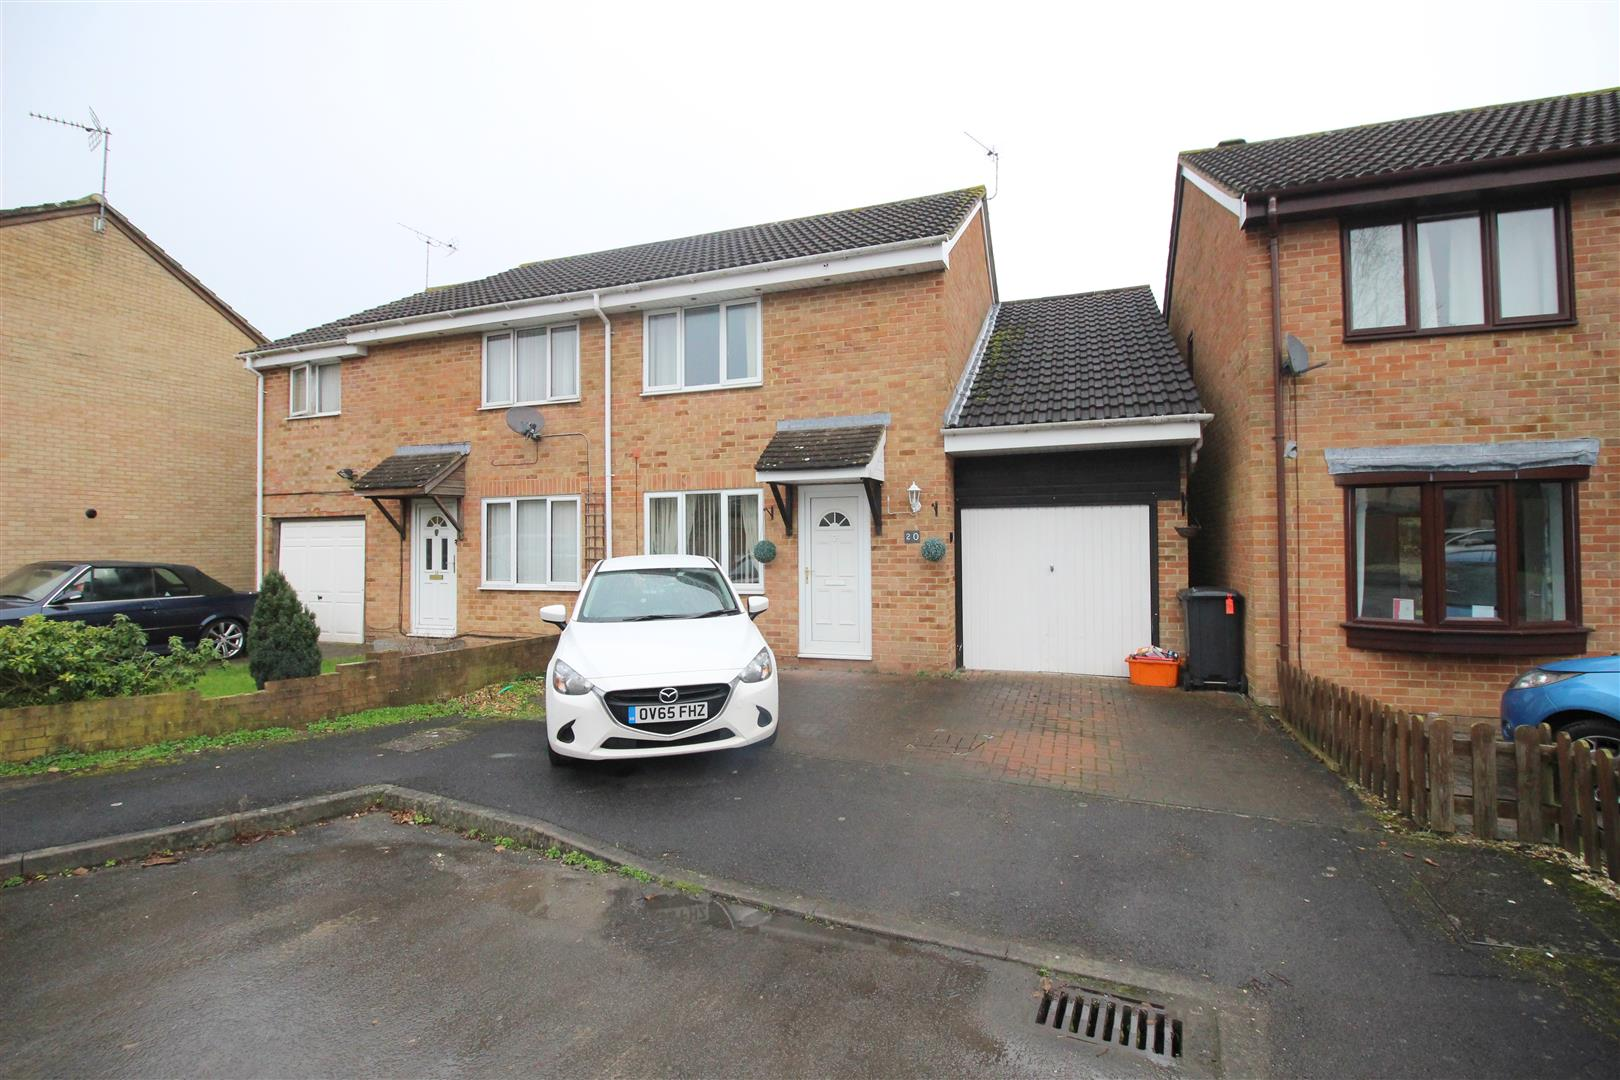 3 Bedrooms Property for sale in Lineacre Close, Grange Park, Swindon